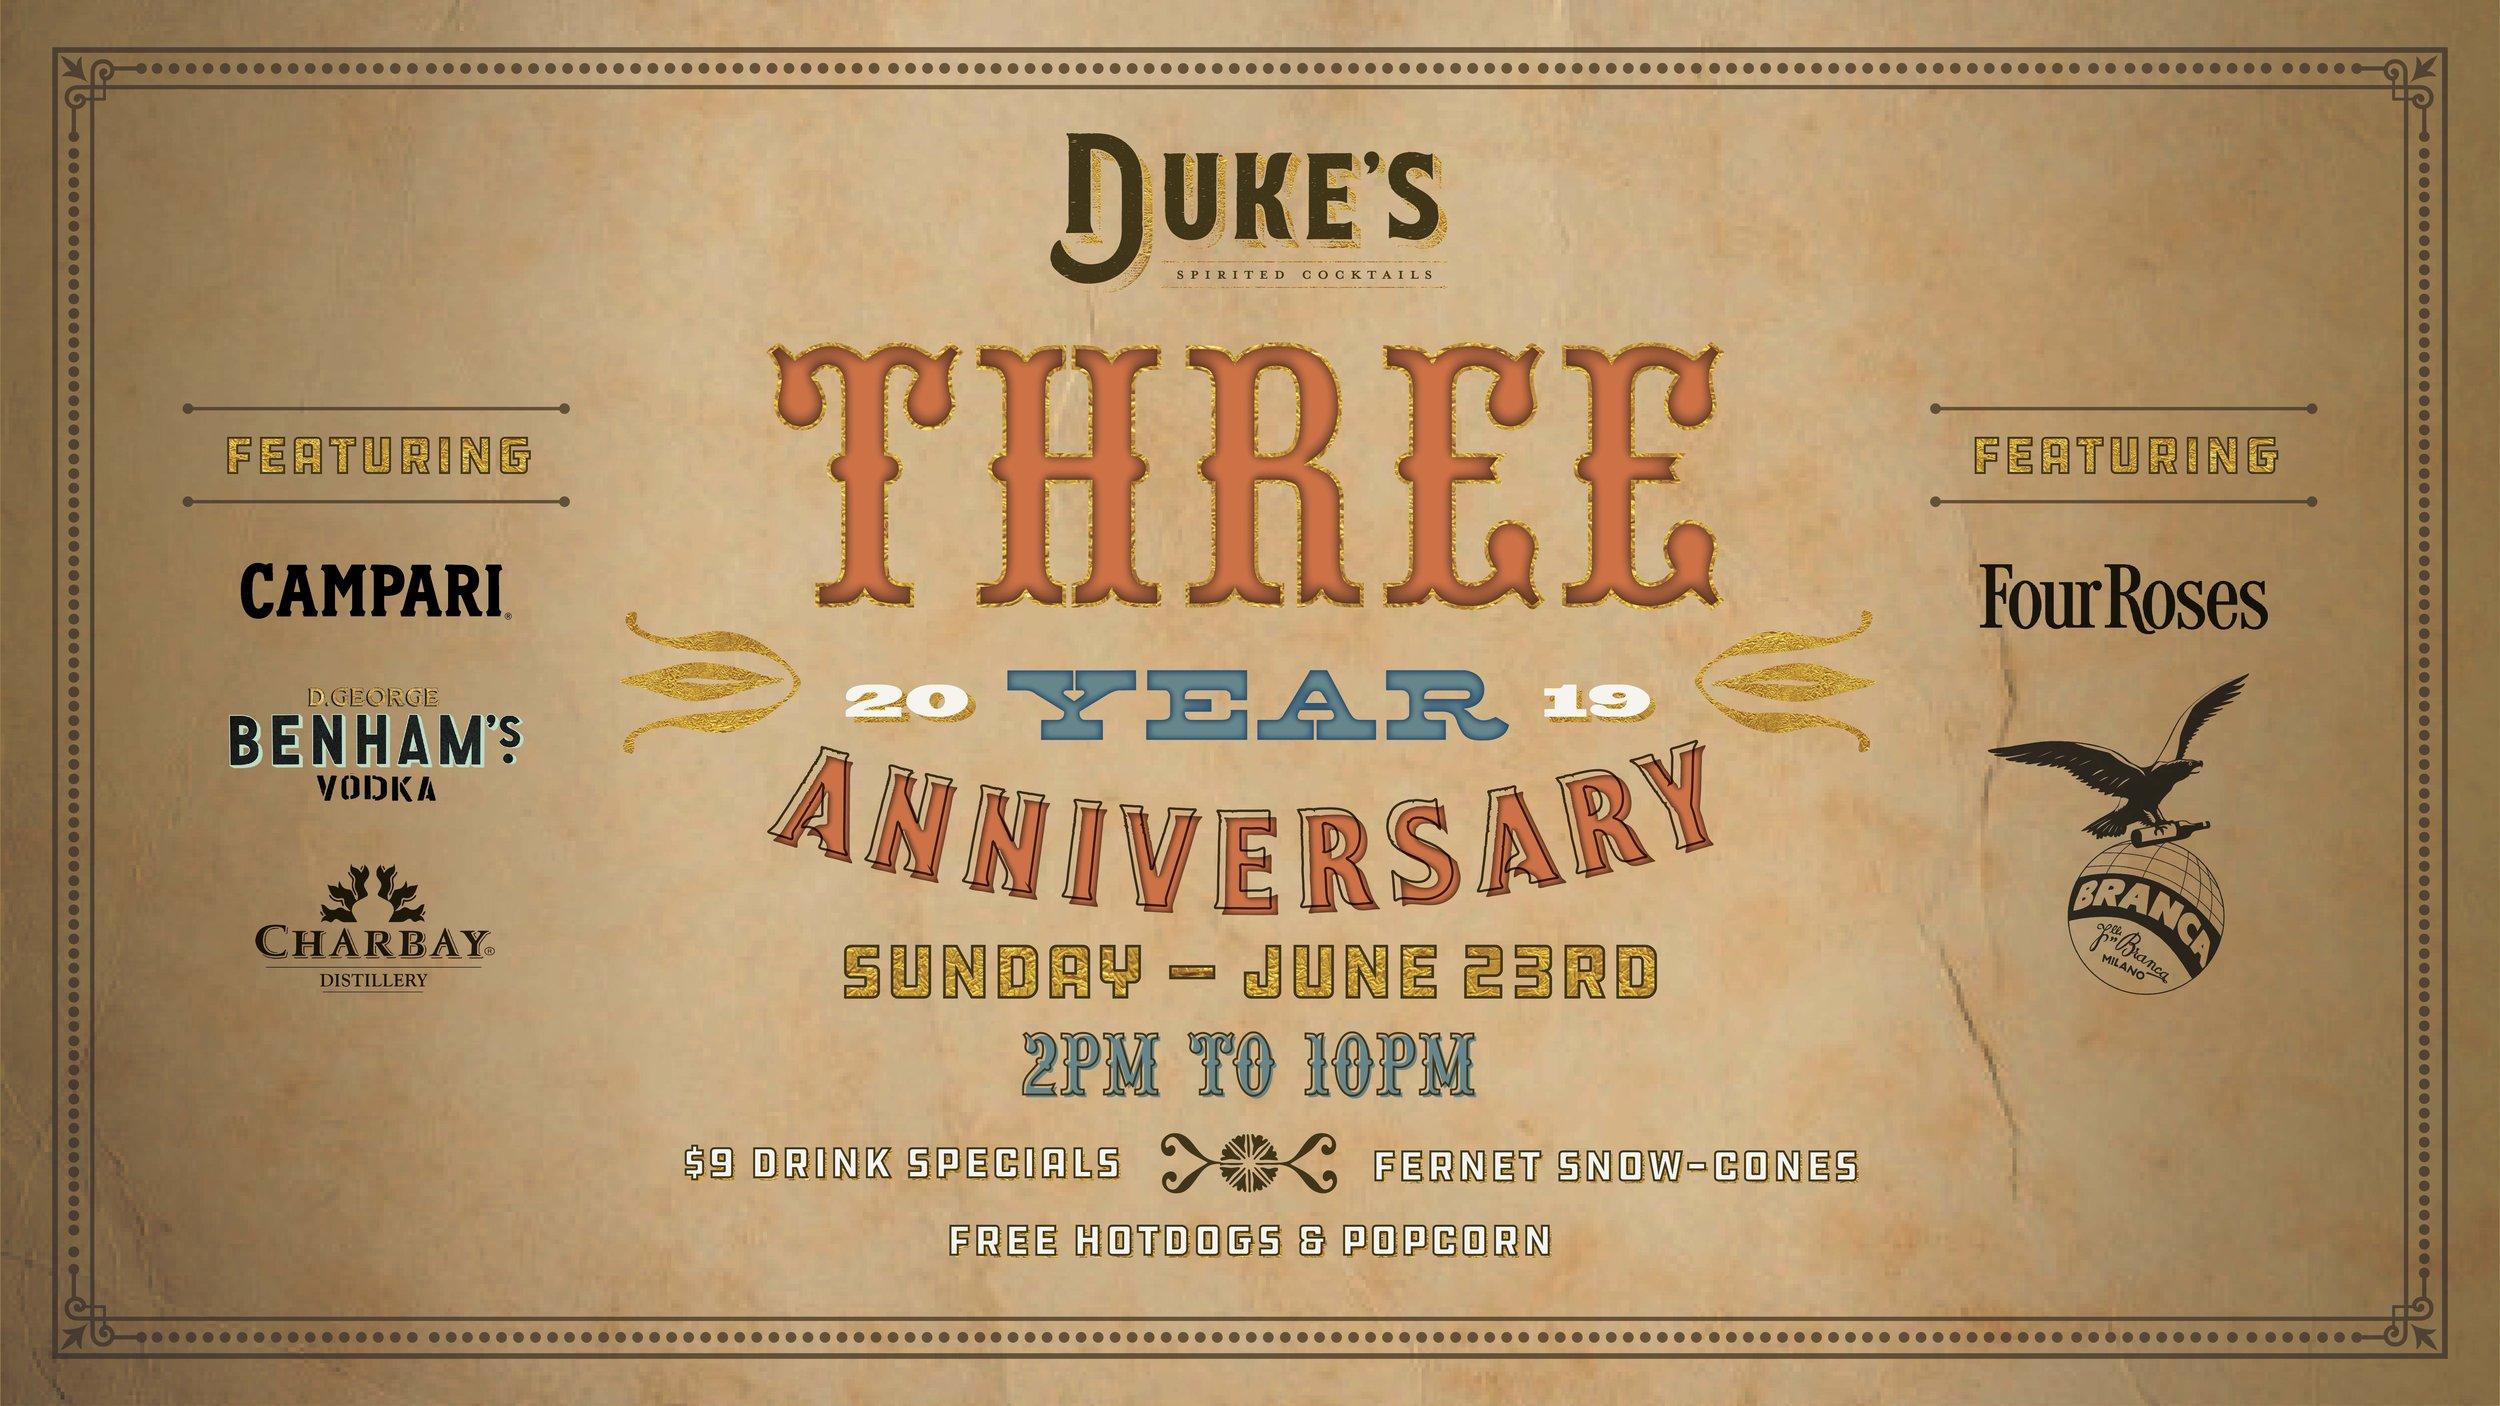 Dukes-3AnniversaryParty-FB-061519.jpg